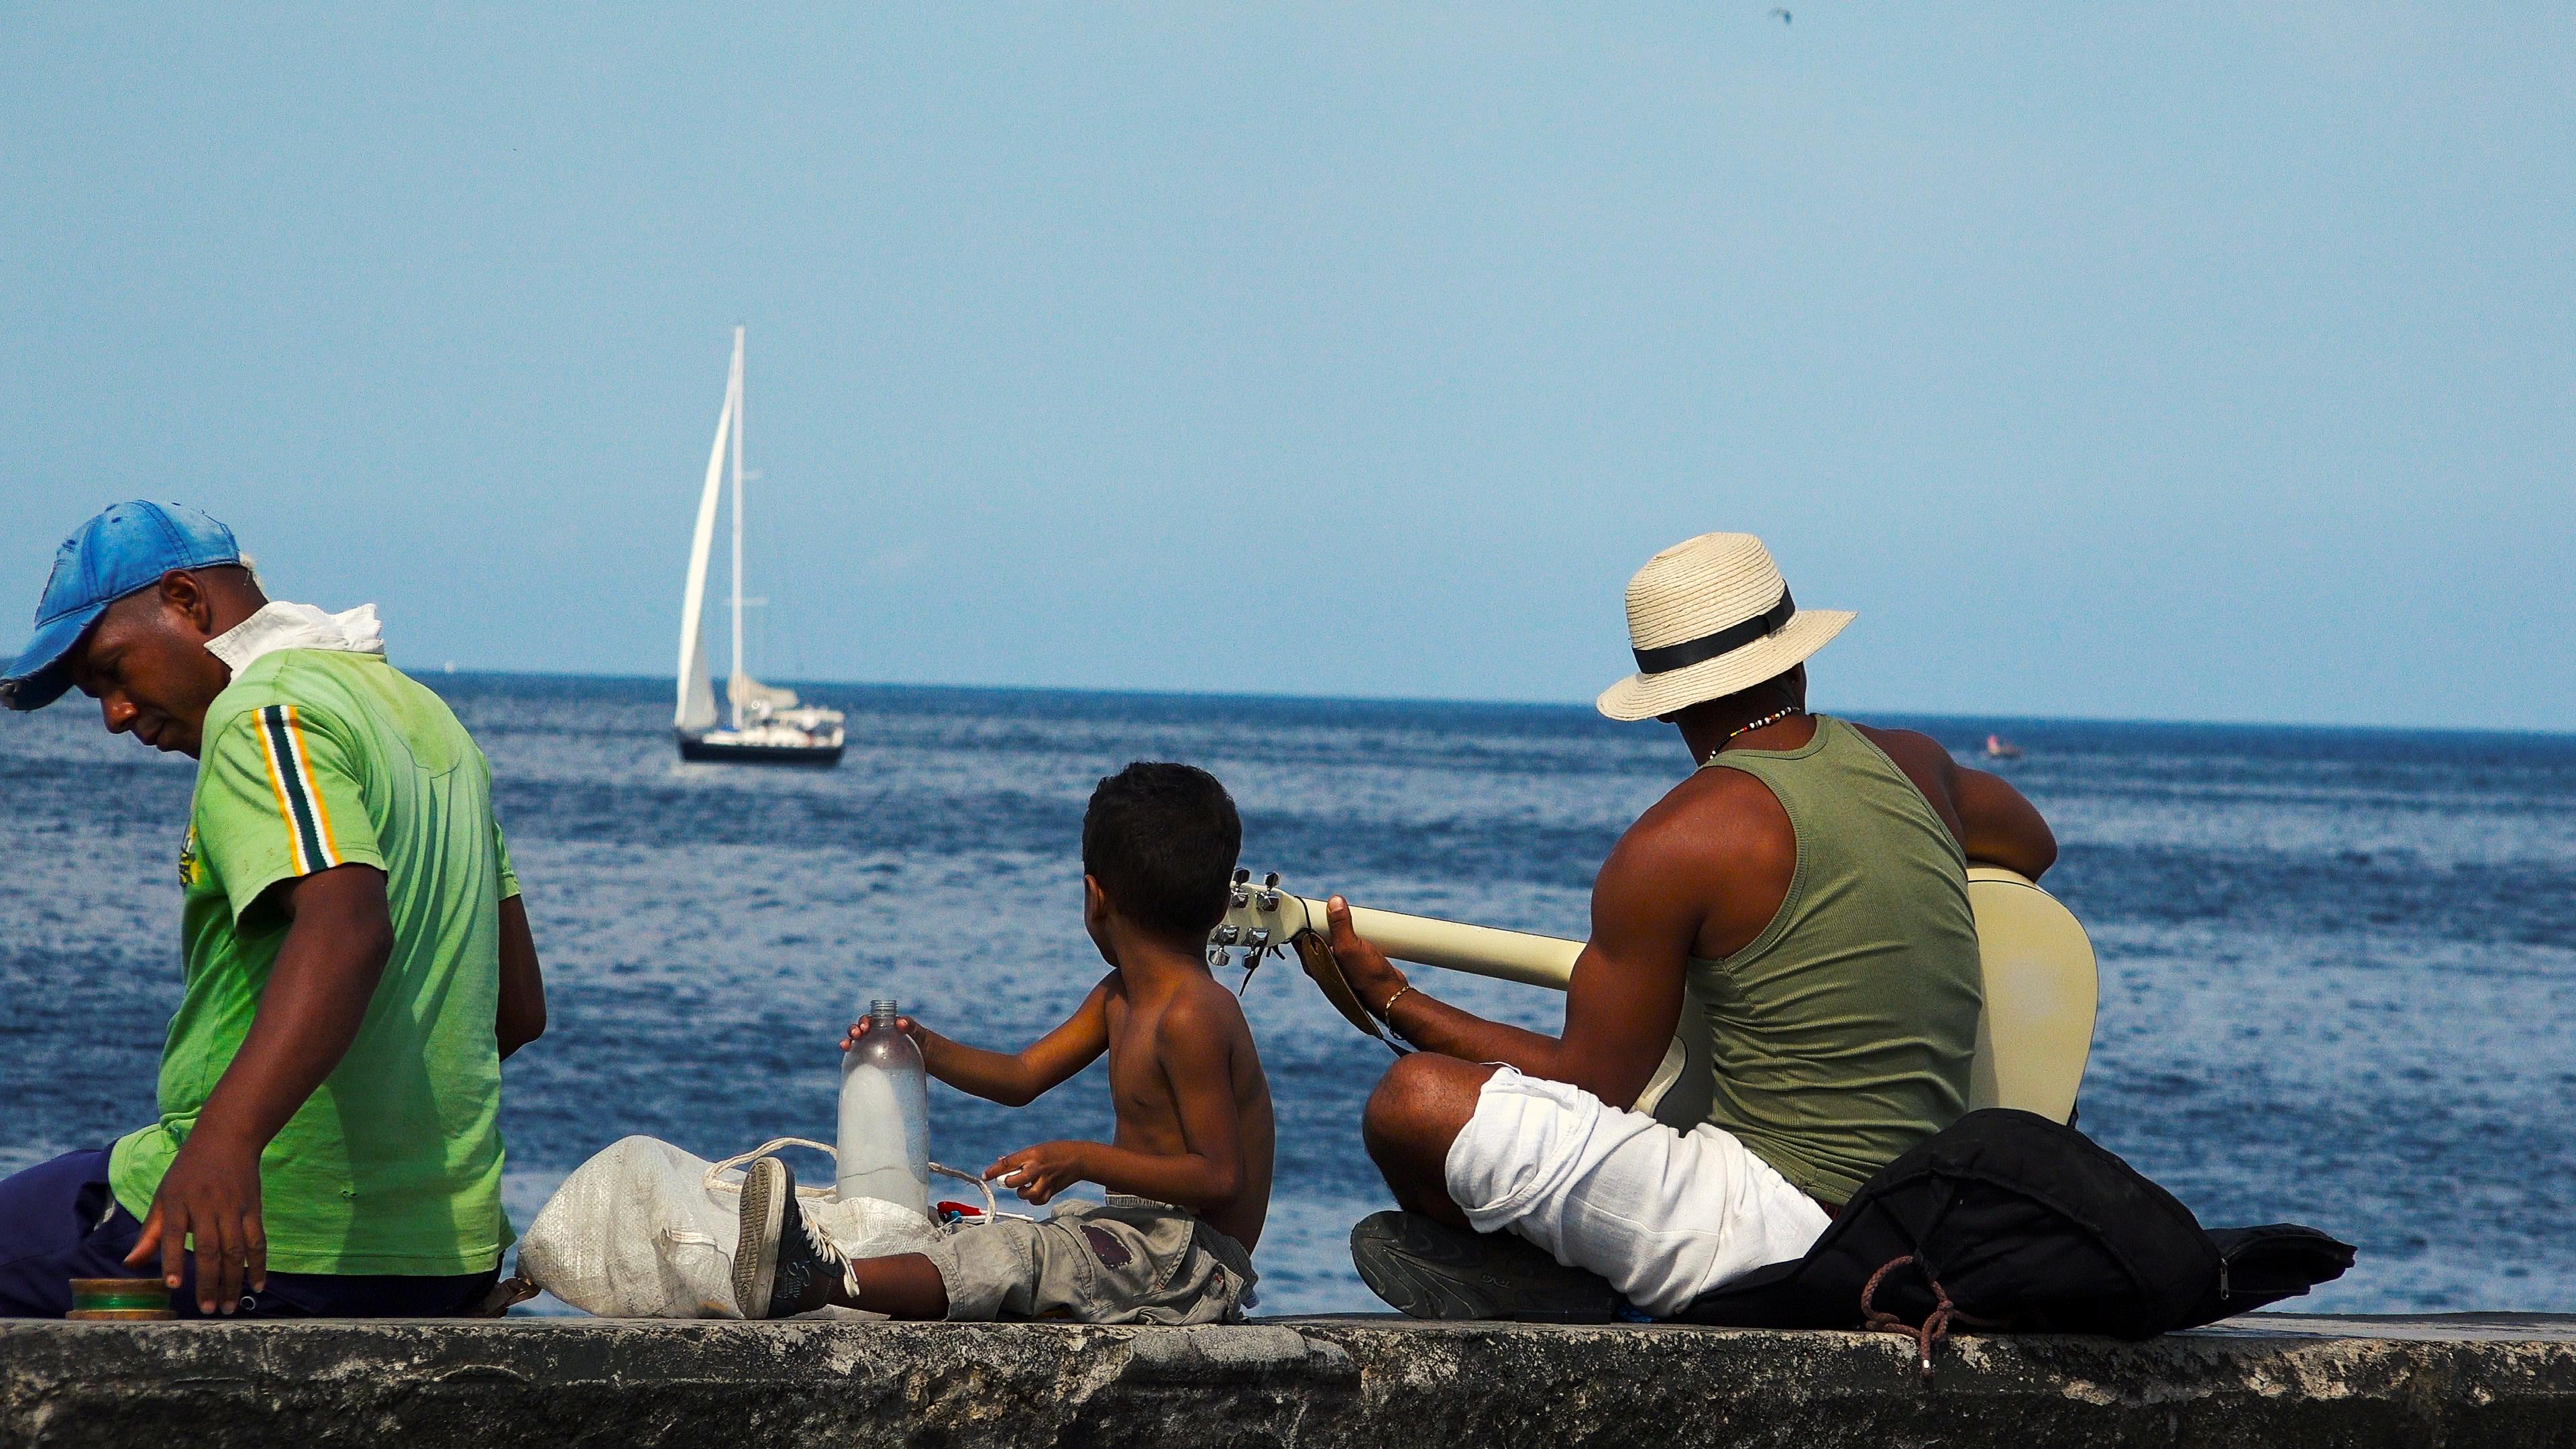 Cuba by Ashley Love